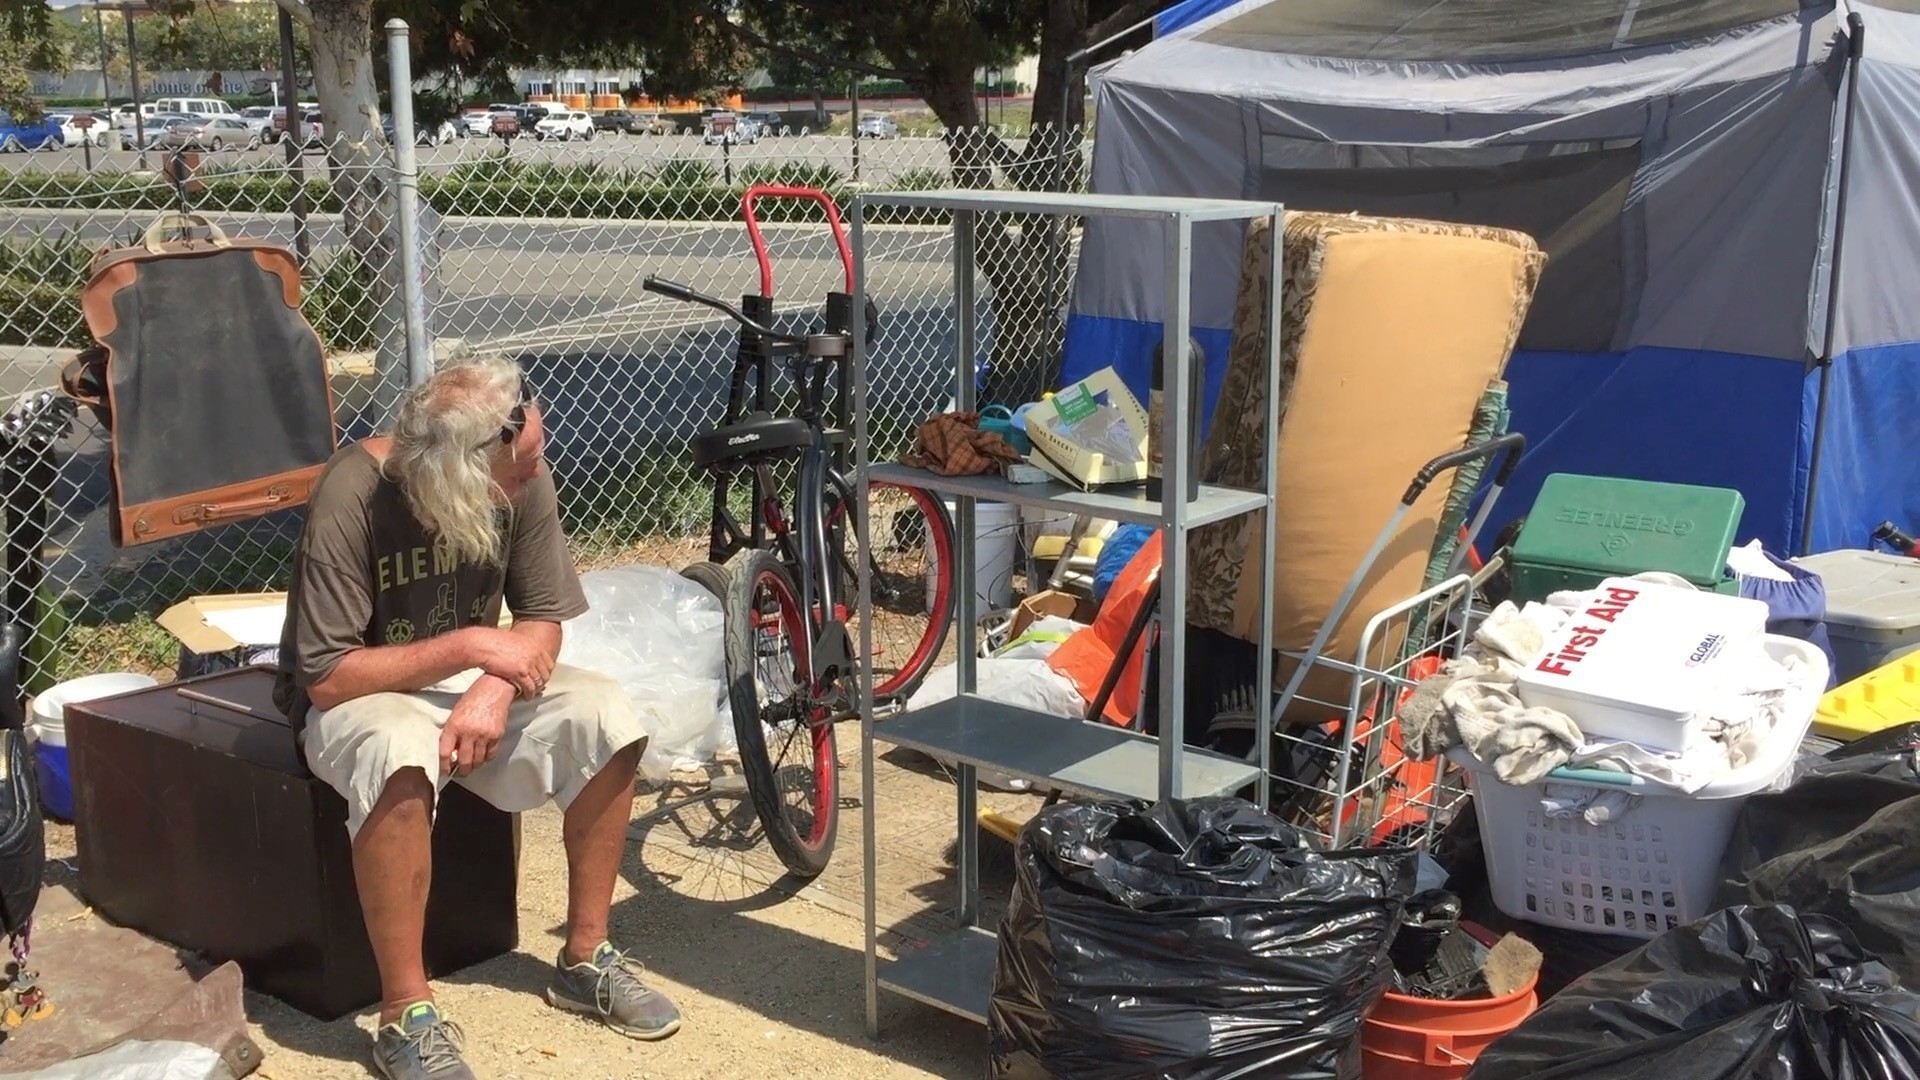 Homeless encampment near Santa Ana River is moved - Los